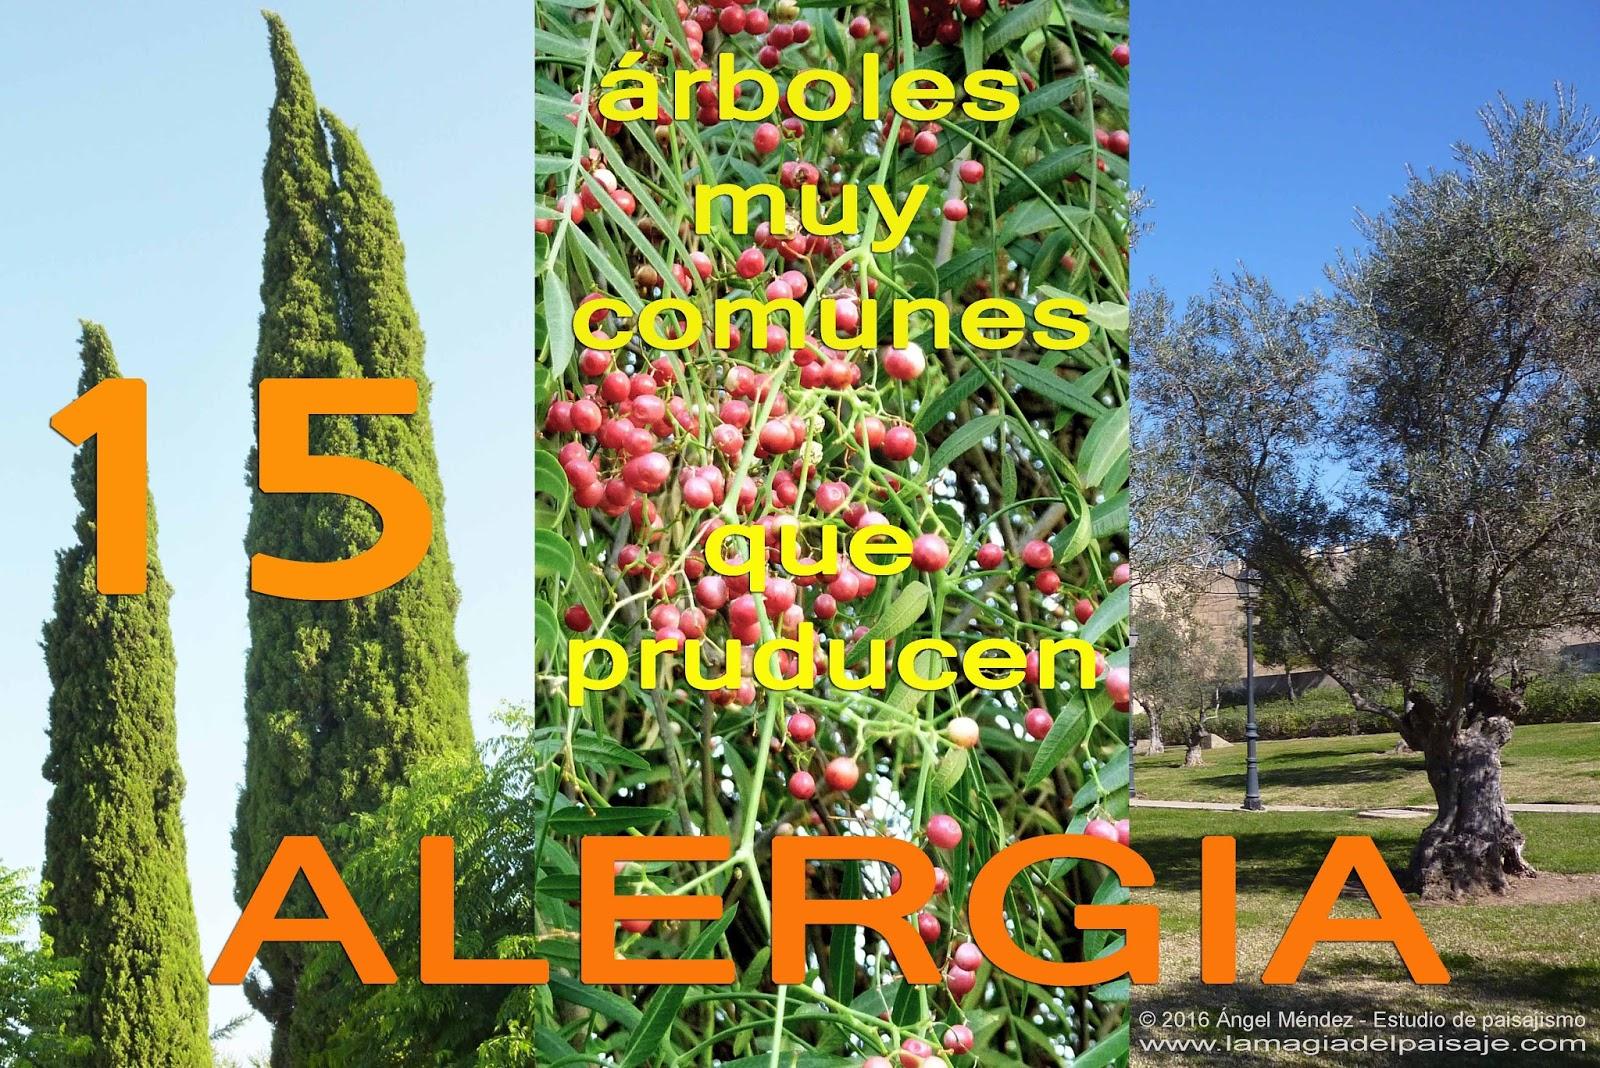 15 rboles muy comunes que producen alergia for Lista de arboles perennes